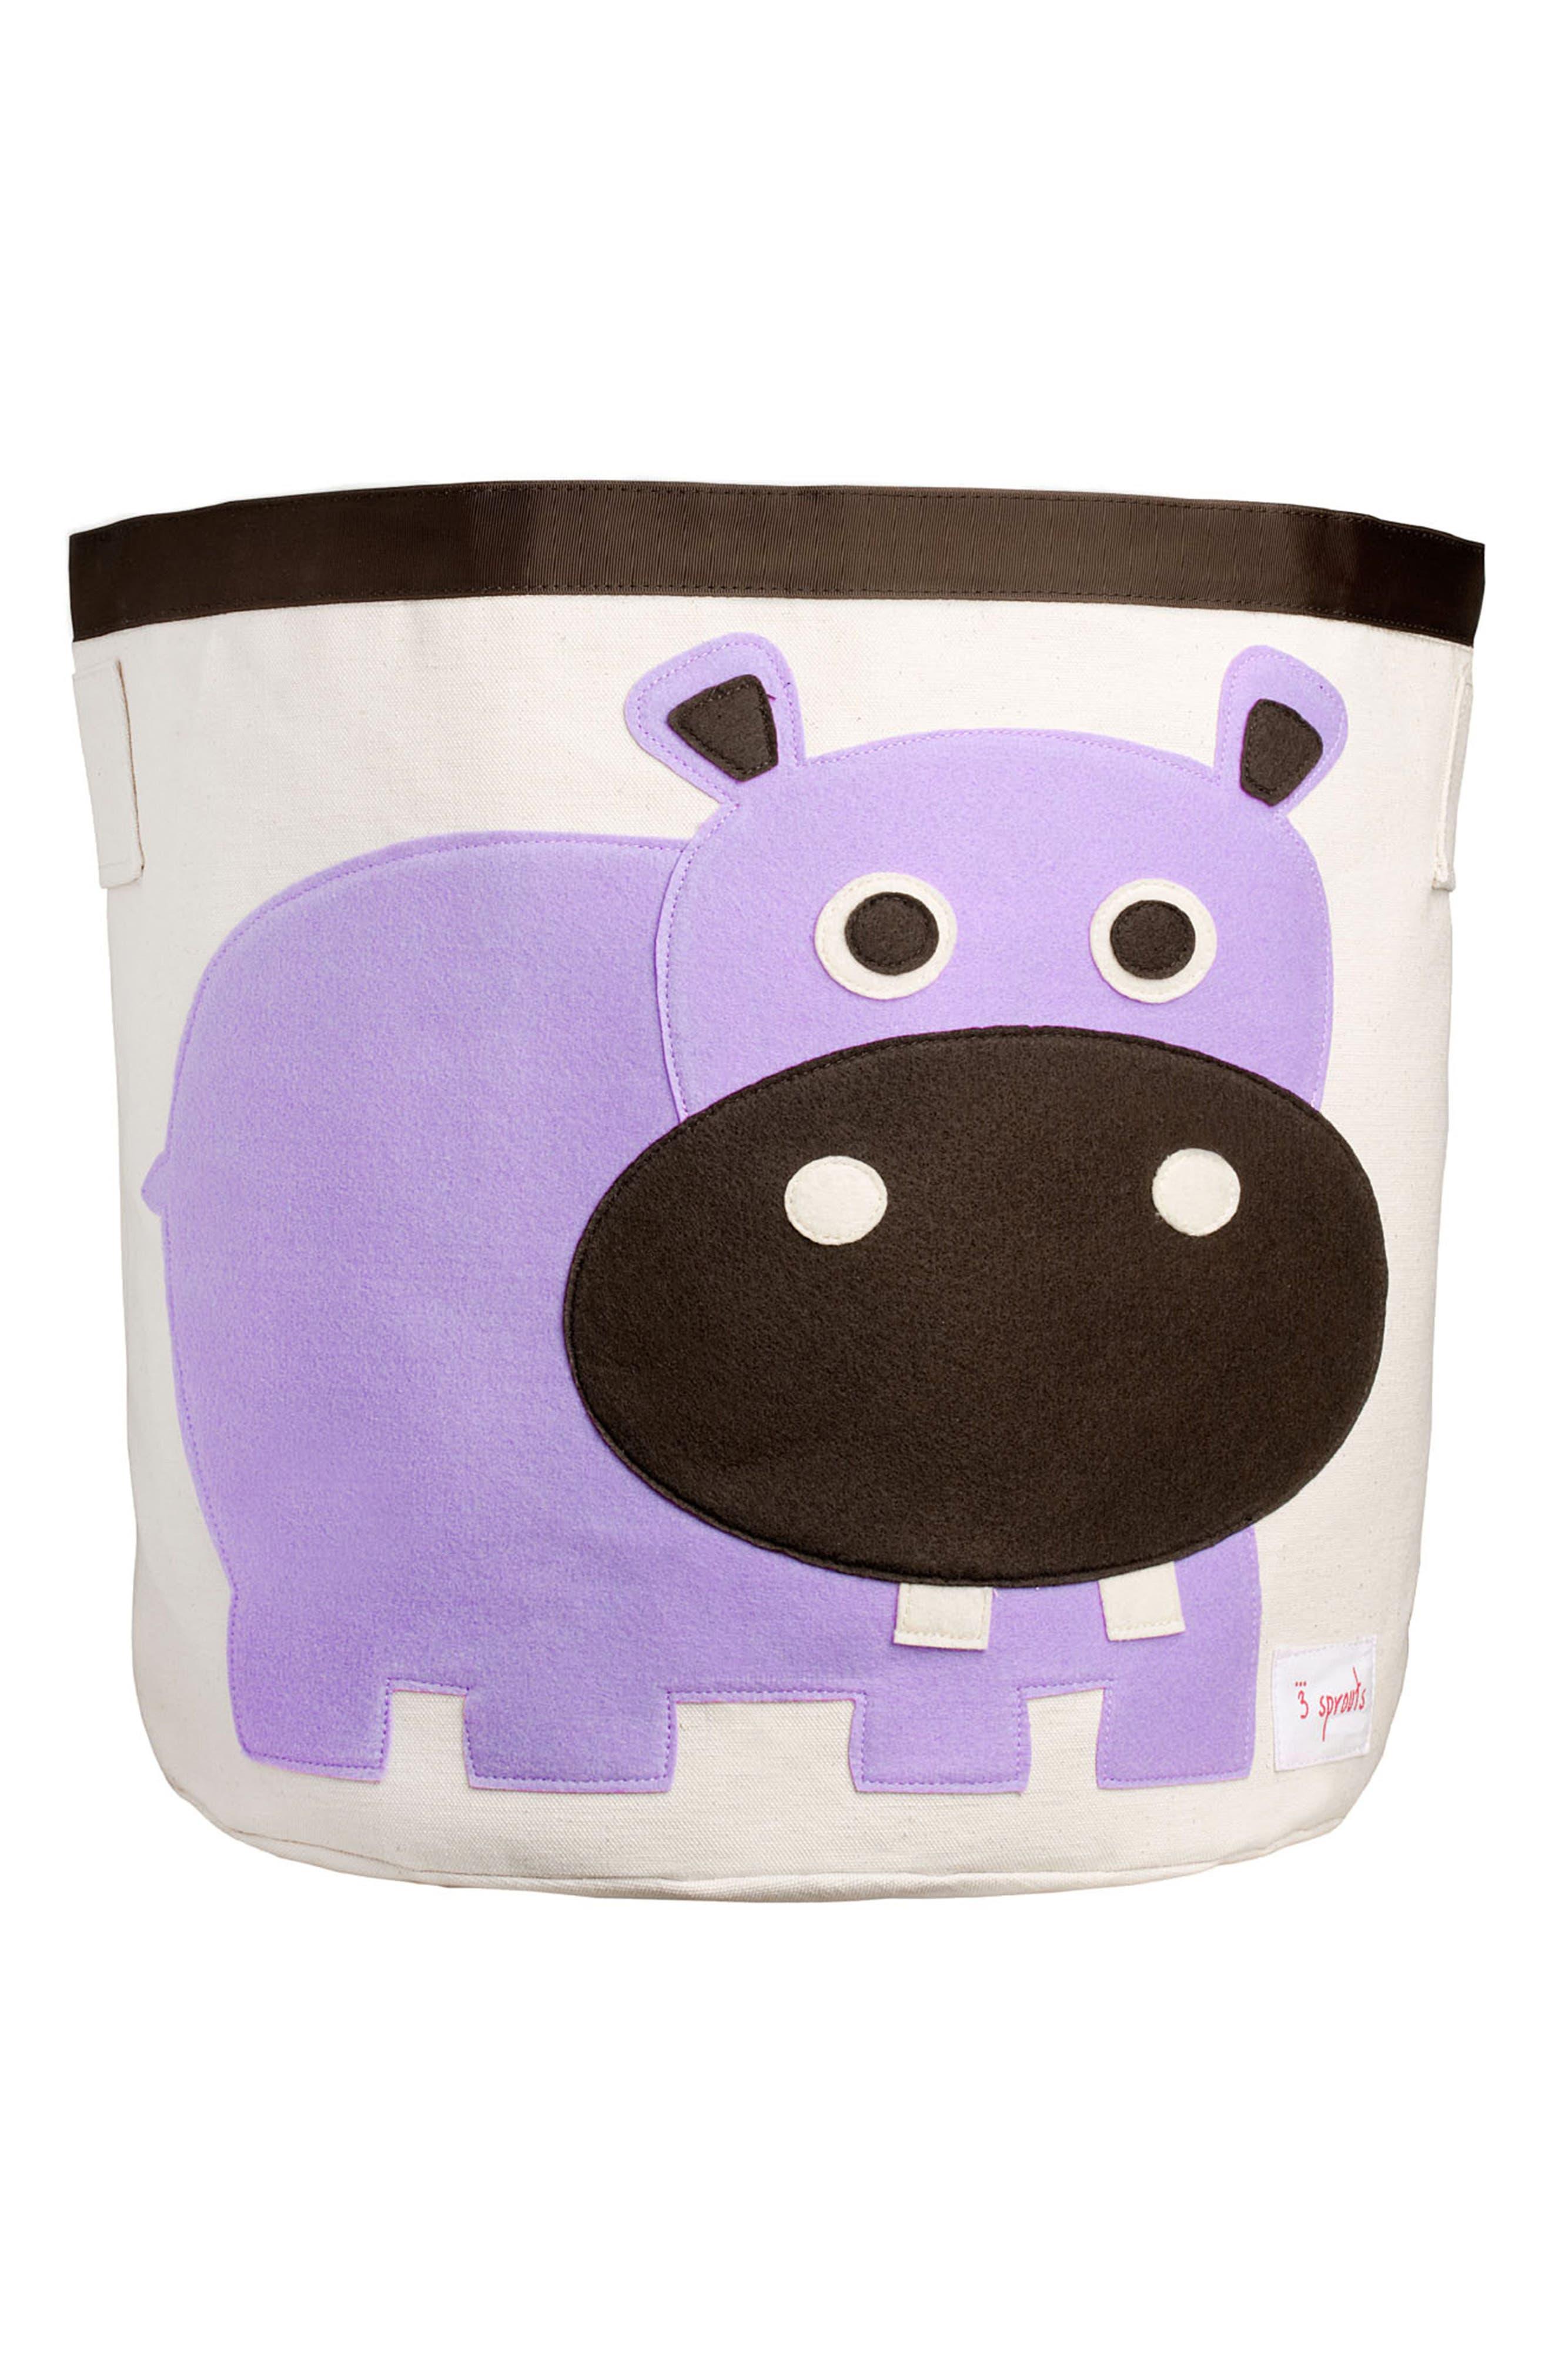 Hippo Canvas Storage Bin,                             Main thumbnail 1, color,                             500